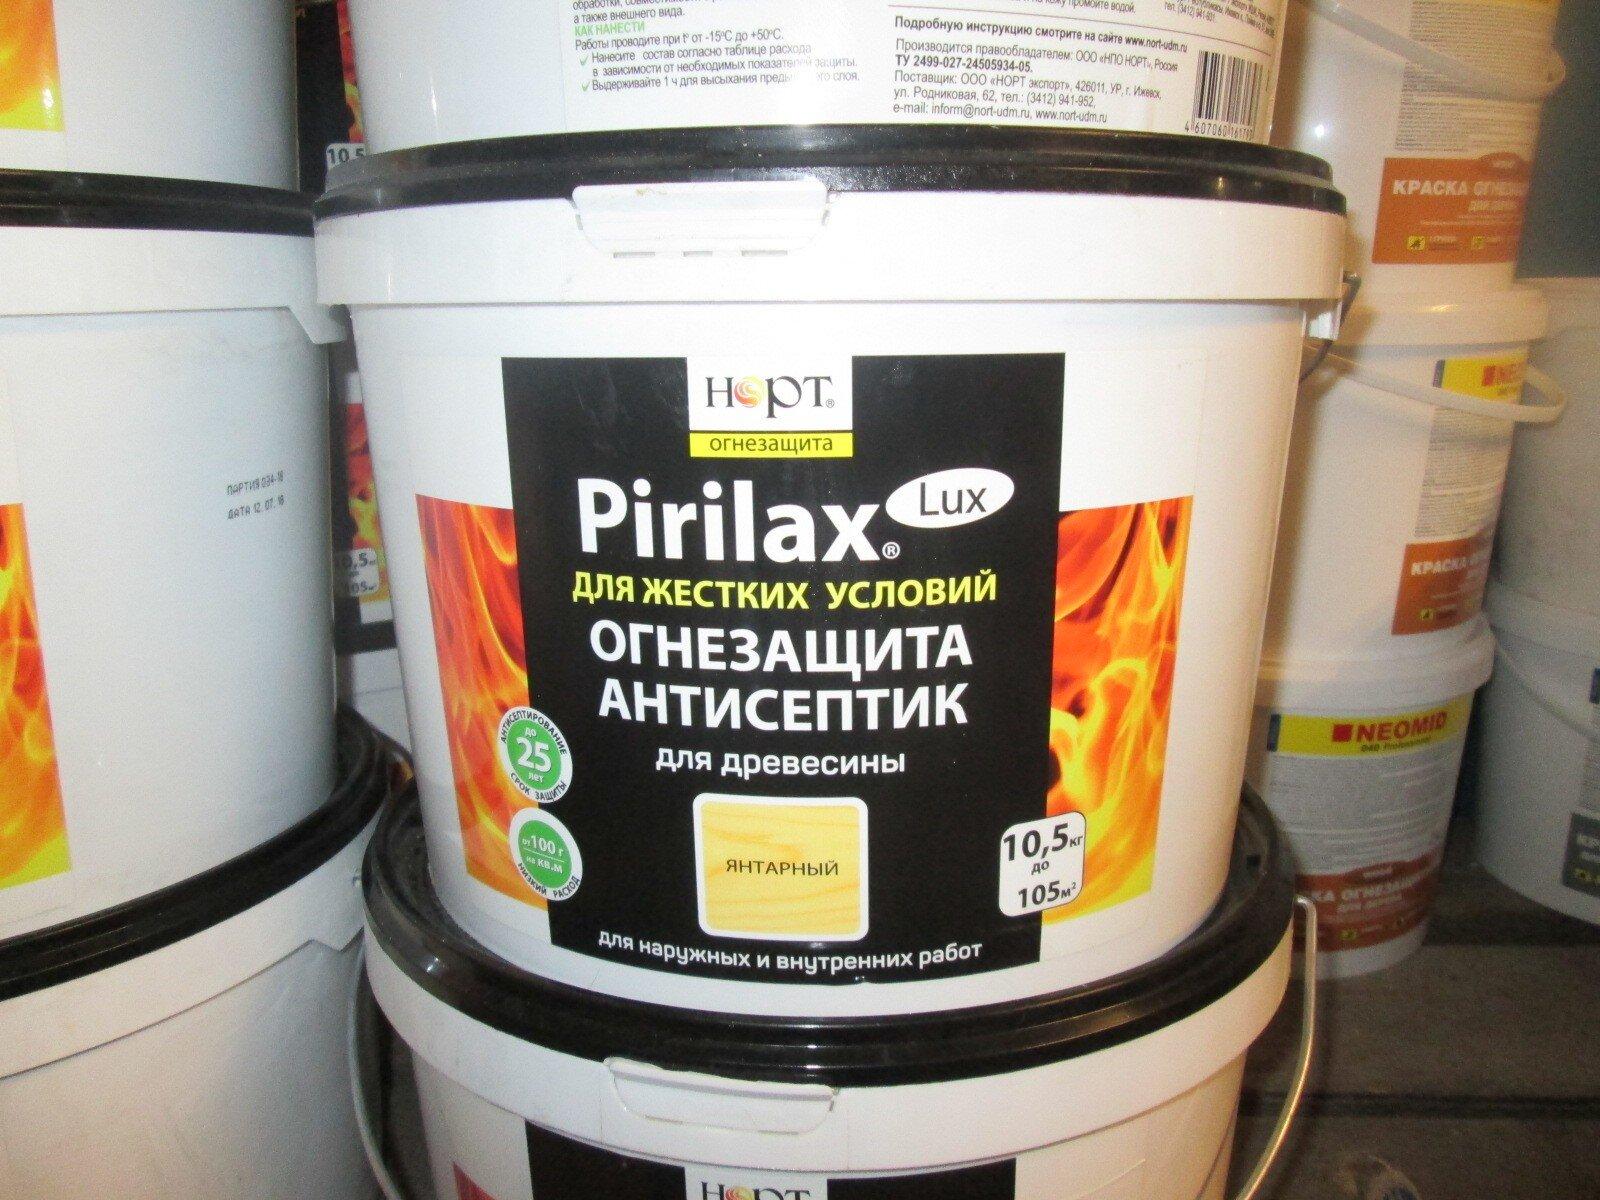 Пирилакс Люкс (Pirilax Lux) - огнезащитный состав, 10.5 кг - фото Пирилакс люкс